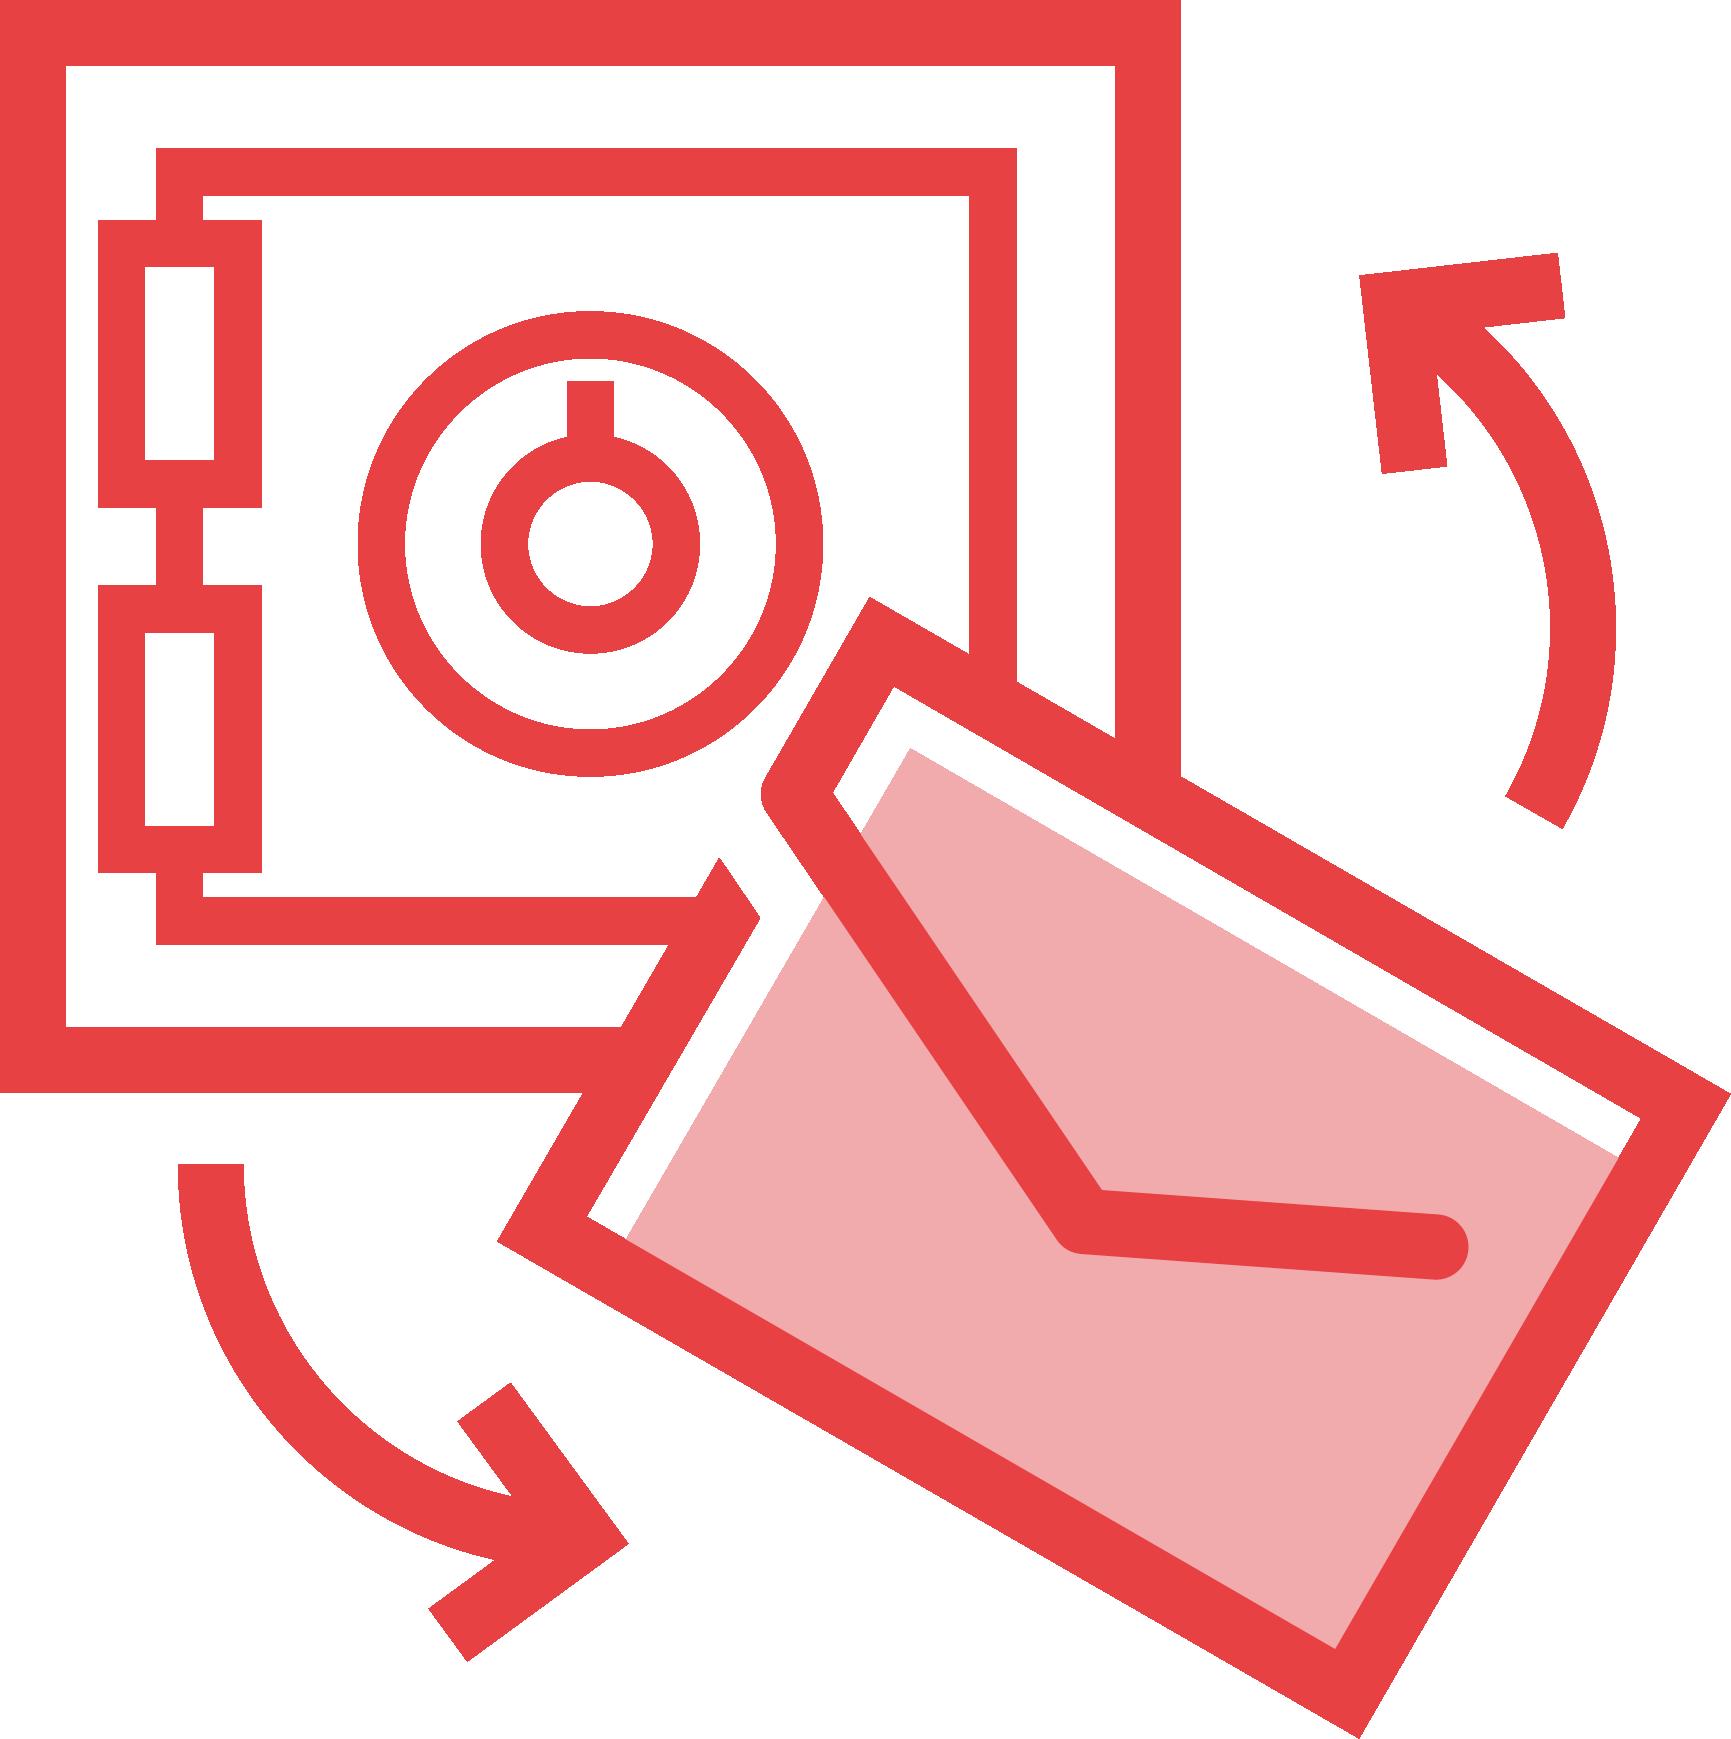 REDDOXX MailDepot - Rechtssichere E-Mail Archivierung